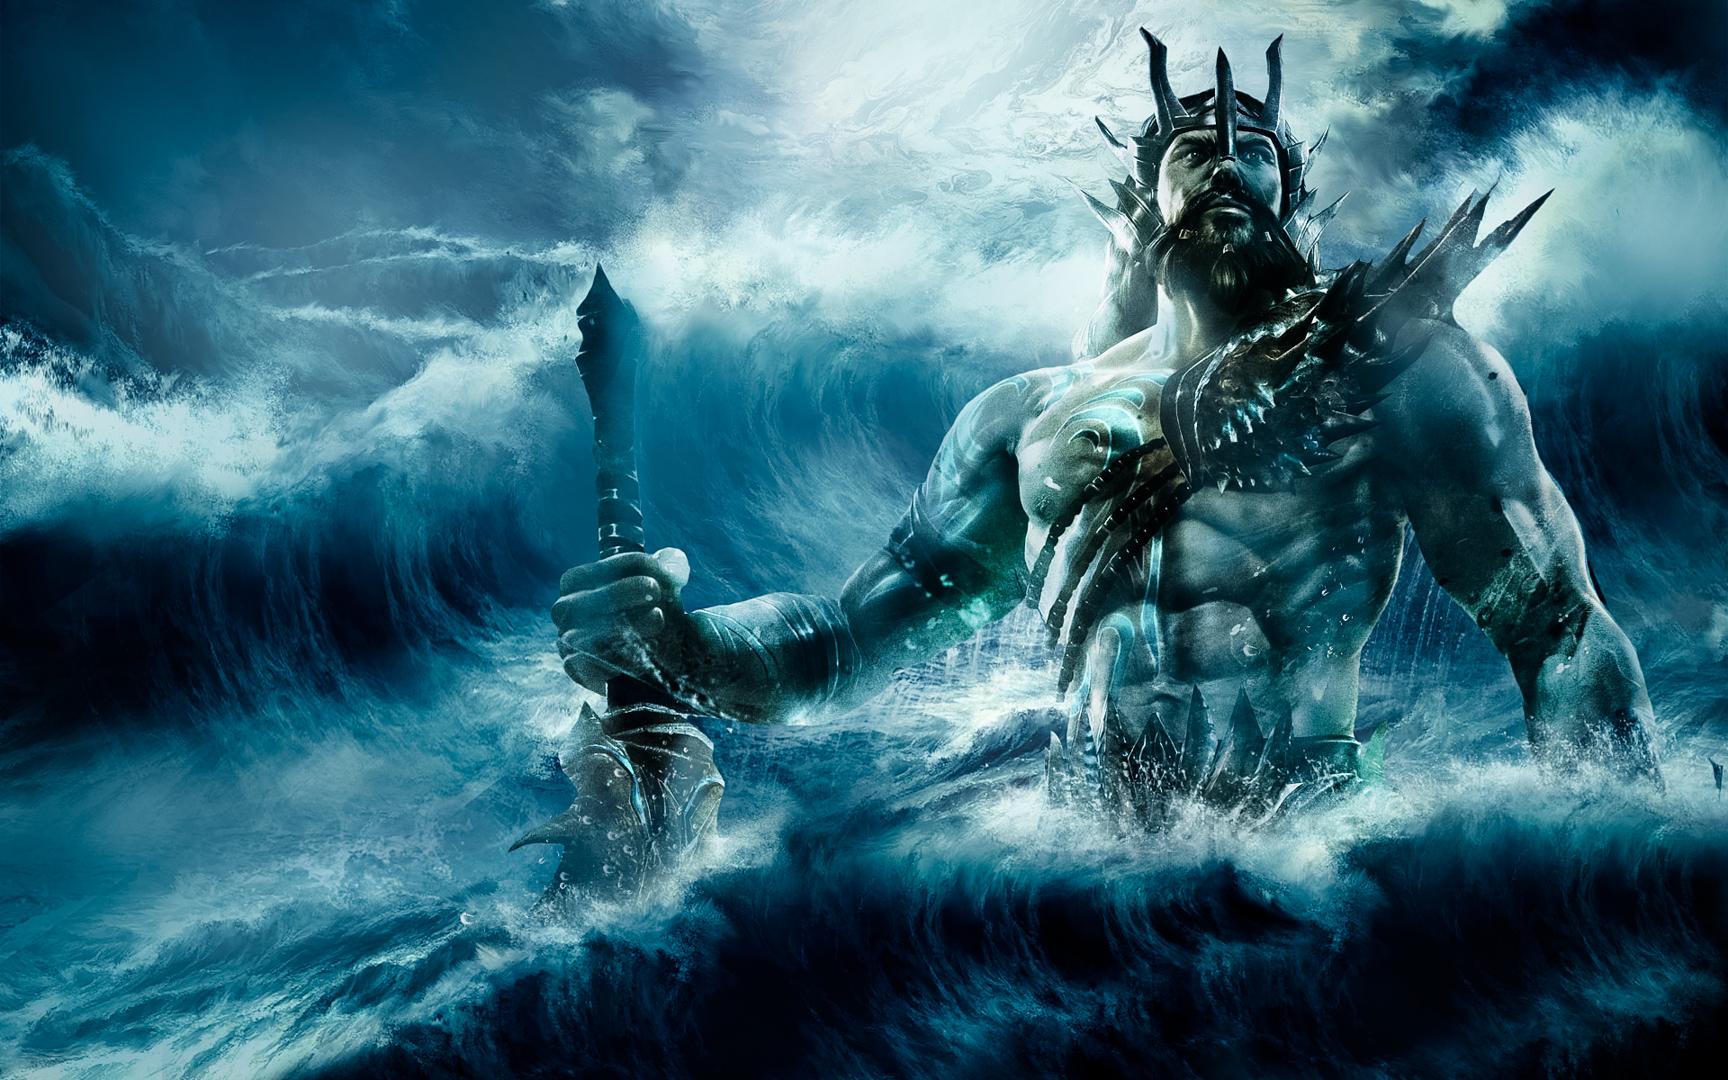 Mnozí obyvatelé si myslí, že katastrofu na jejich hlavy seslal sám bůh Poseidón.